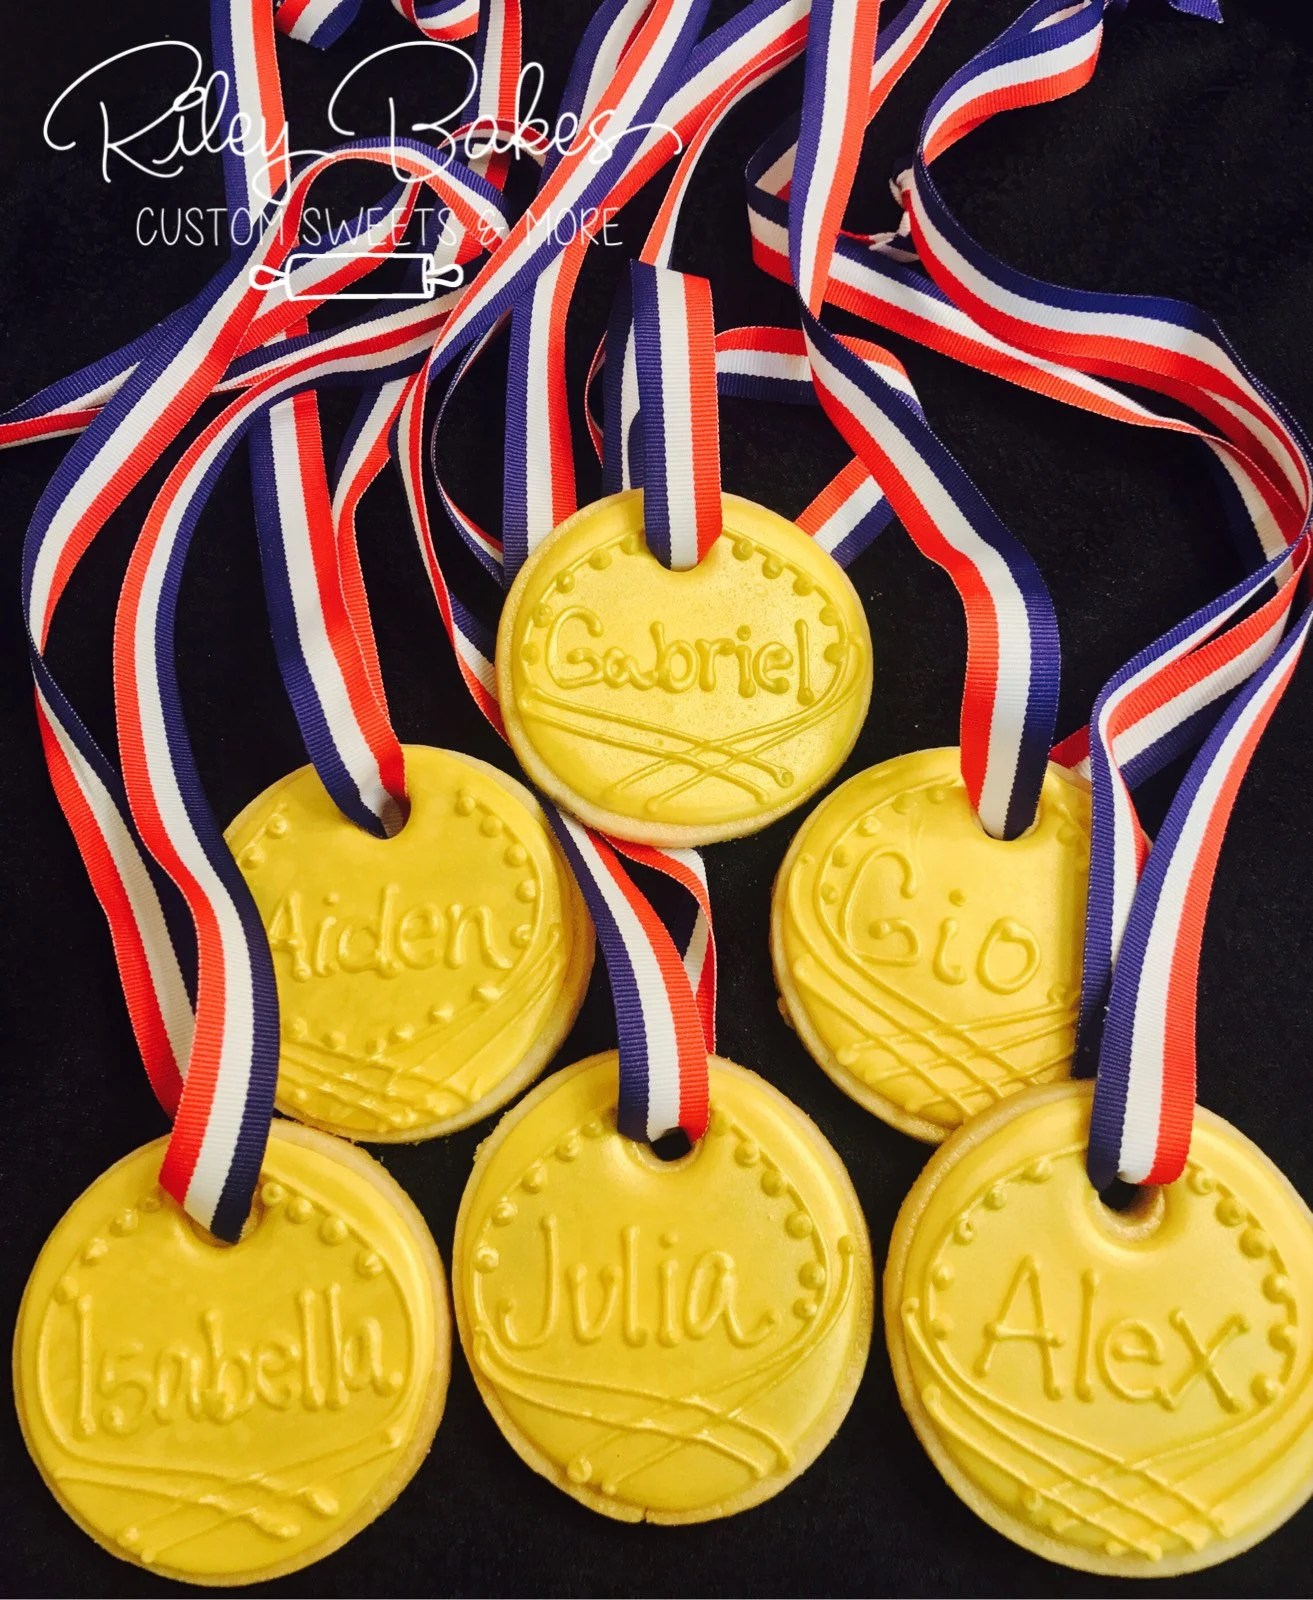 Gold Medal Cookies Olympics Party Ninja Warrior Birthday